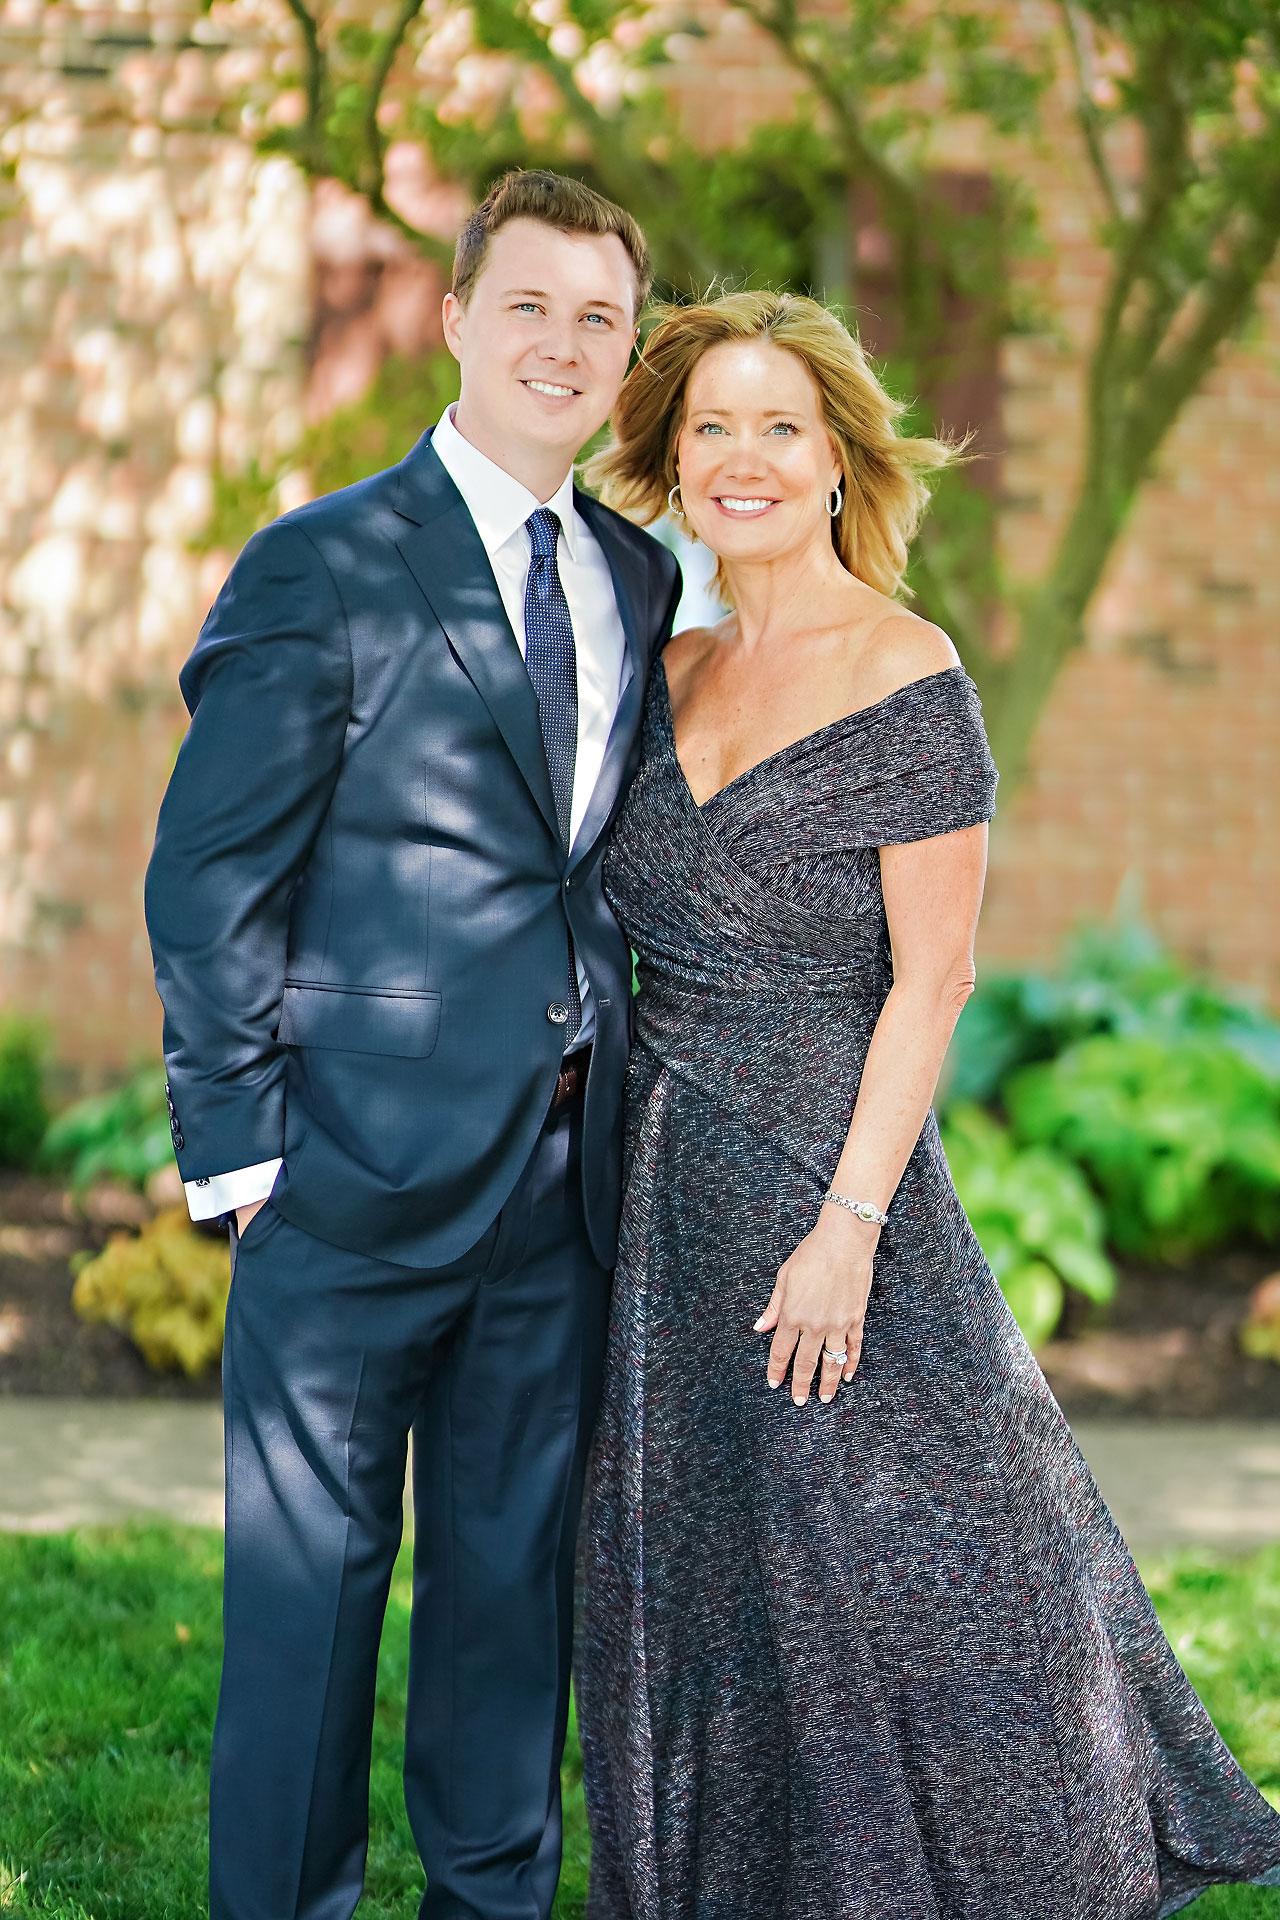 MacKinze John Lafayette Indiana Purdue Wedding 139